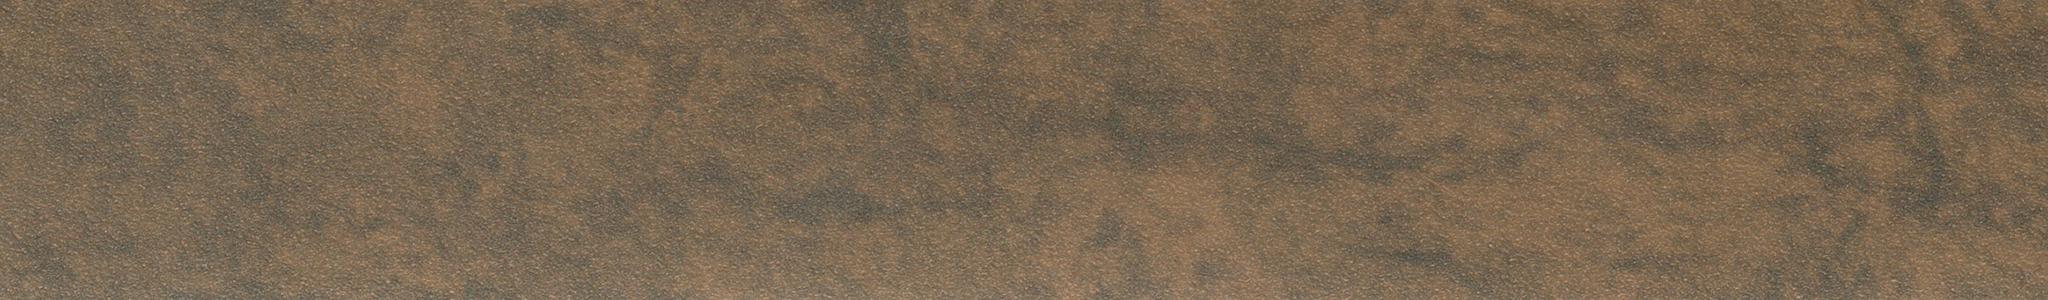 HD 29151 ABS hrana bronze wood perla